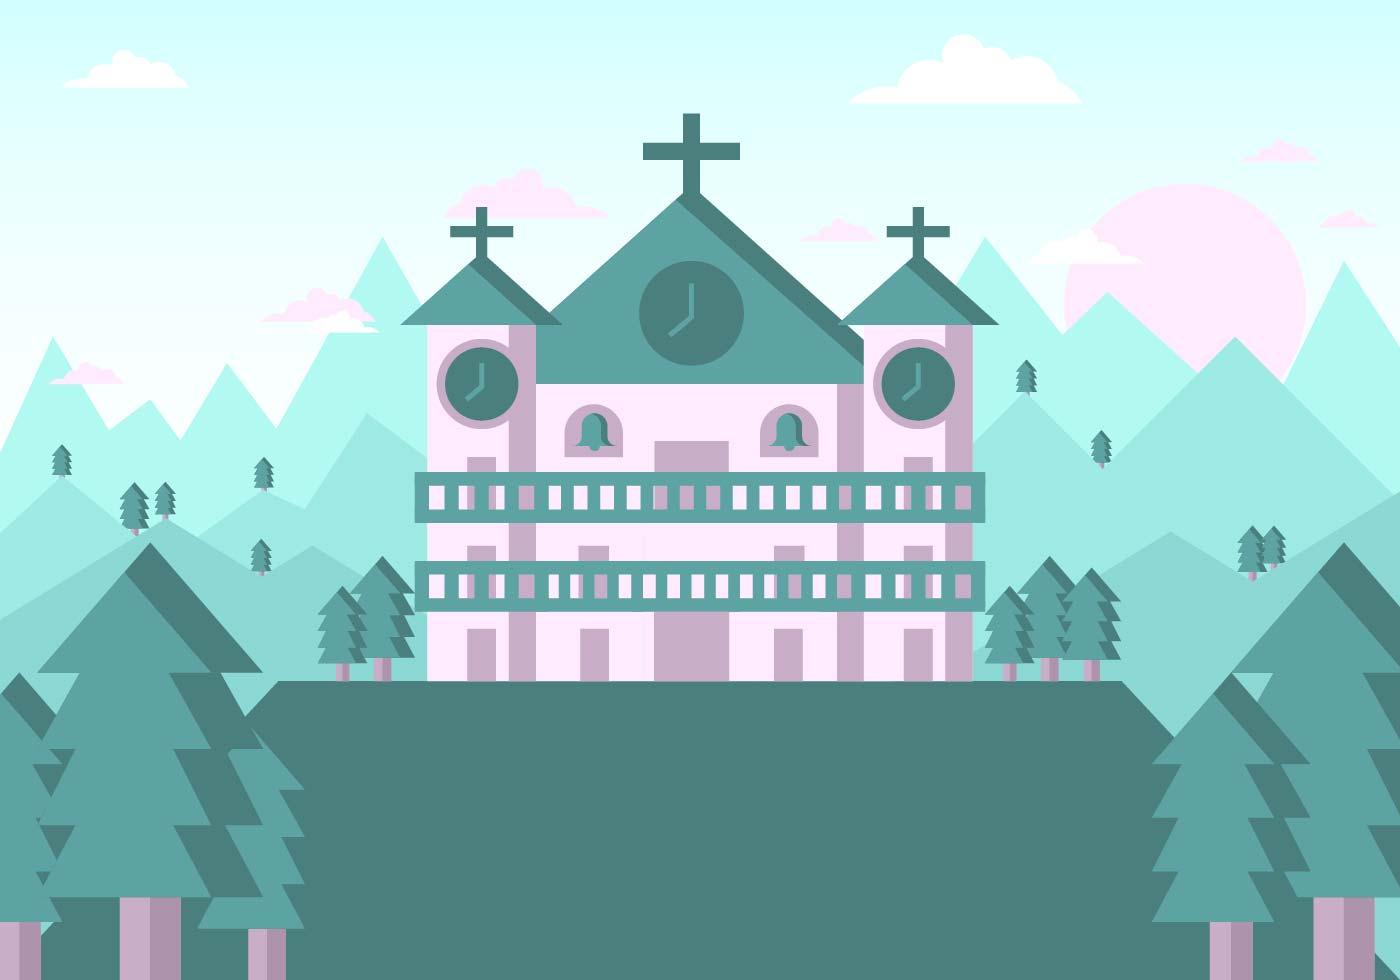 Landscape Illustration Vector Free: Abbey Landscape Illustration Vector #3